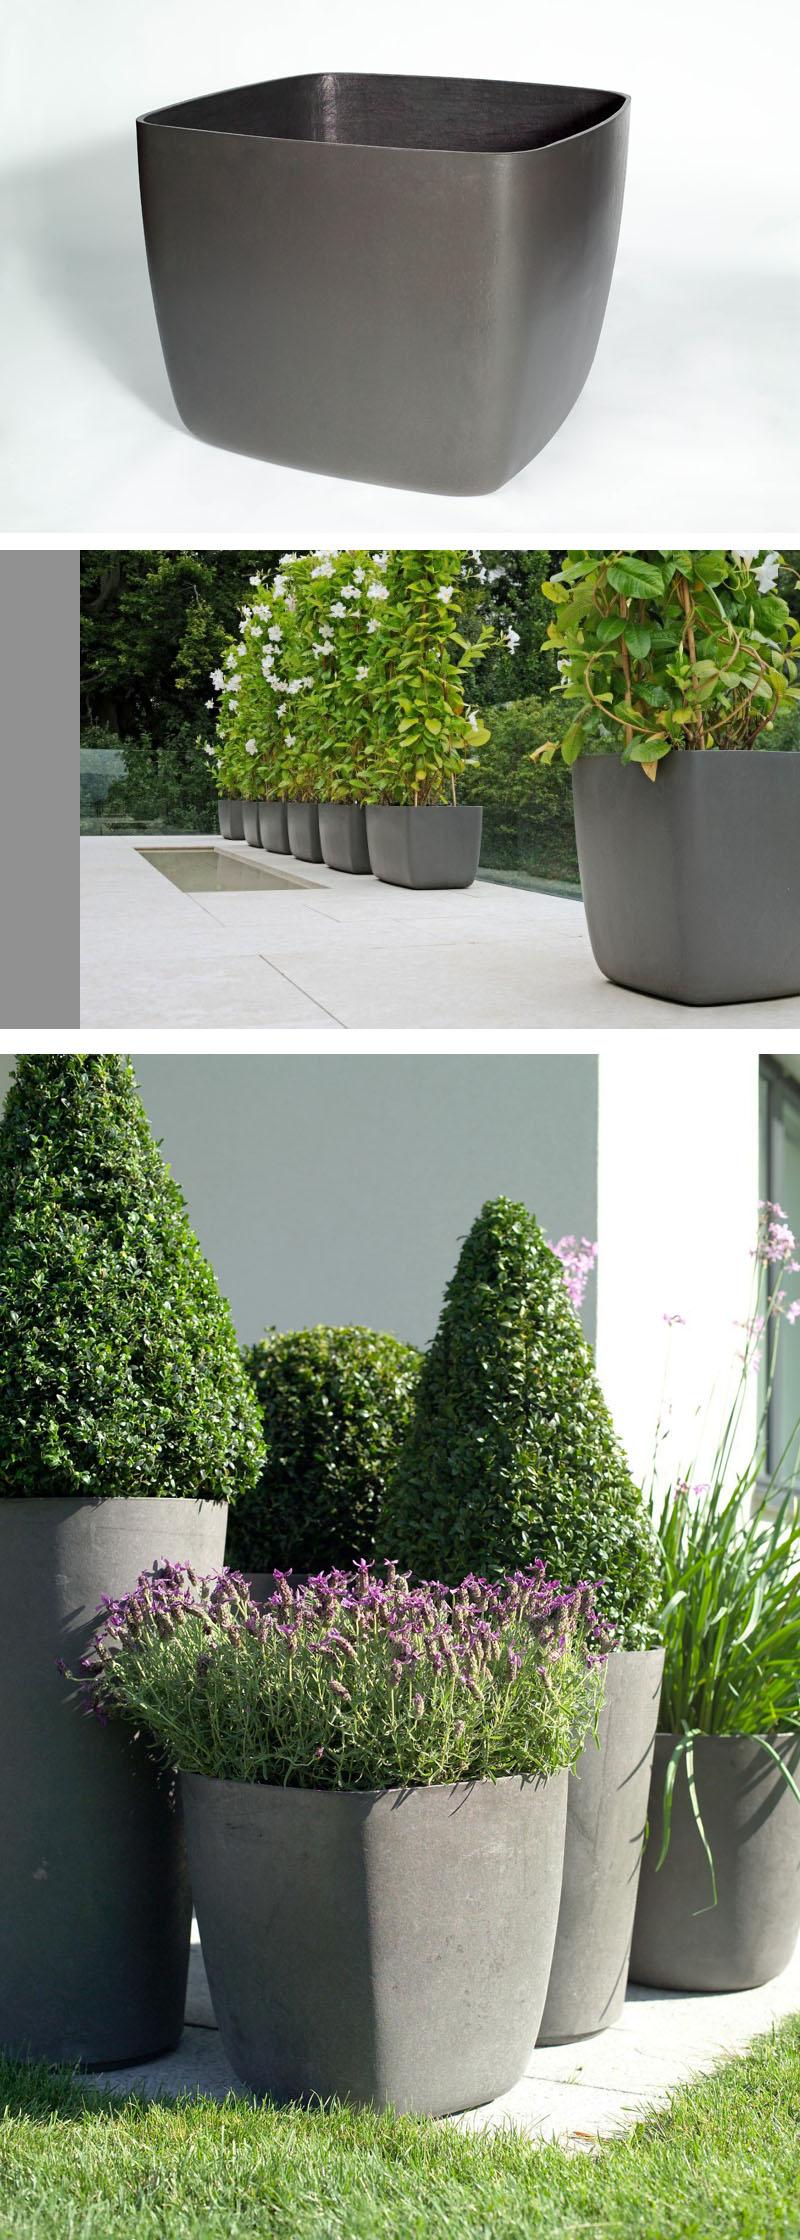 Osaka Large Square Garden Planter/Plant Pot With Rounded